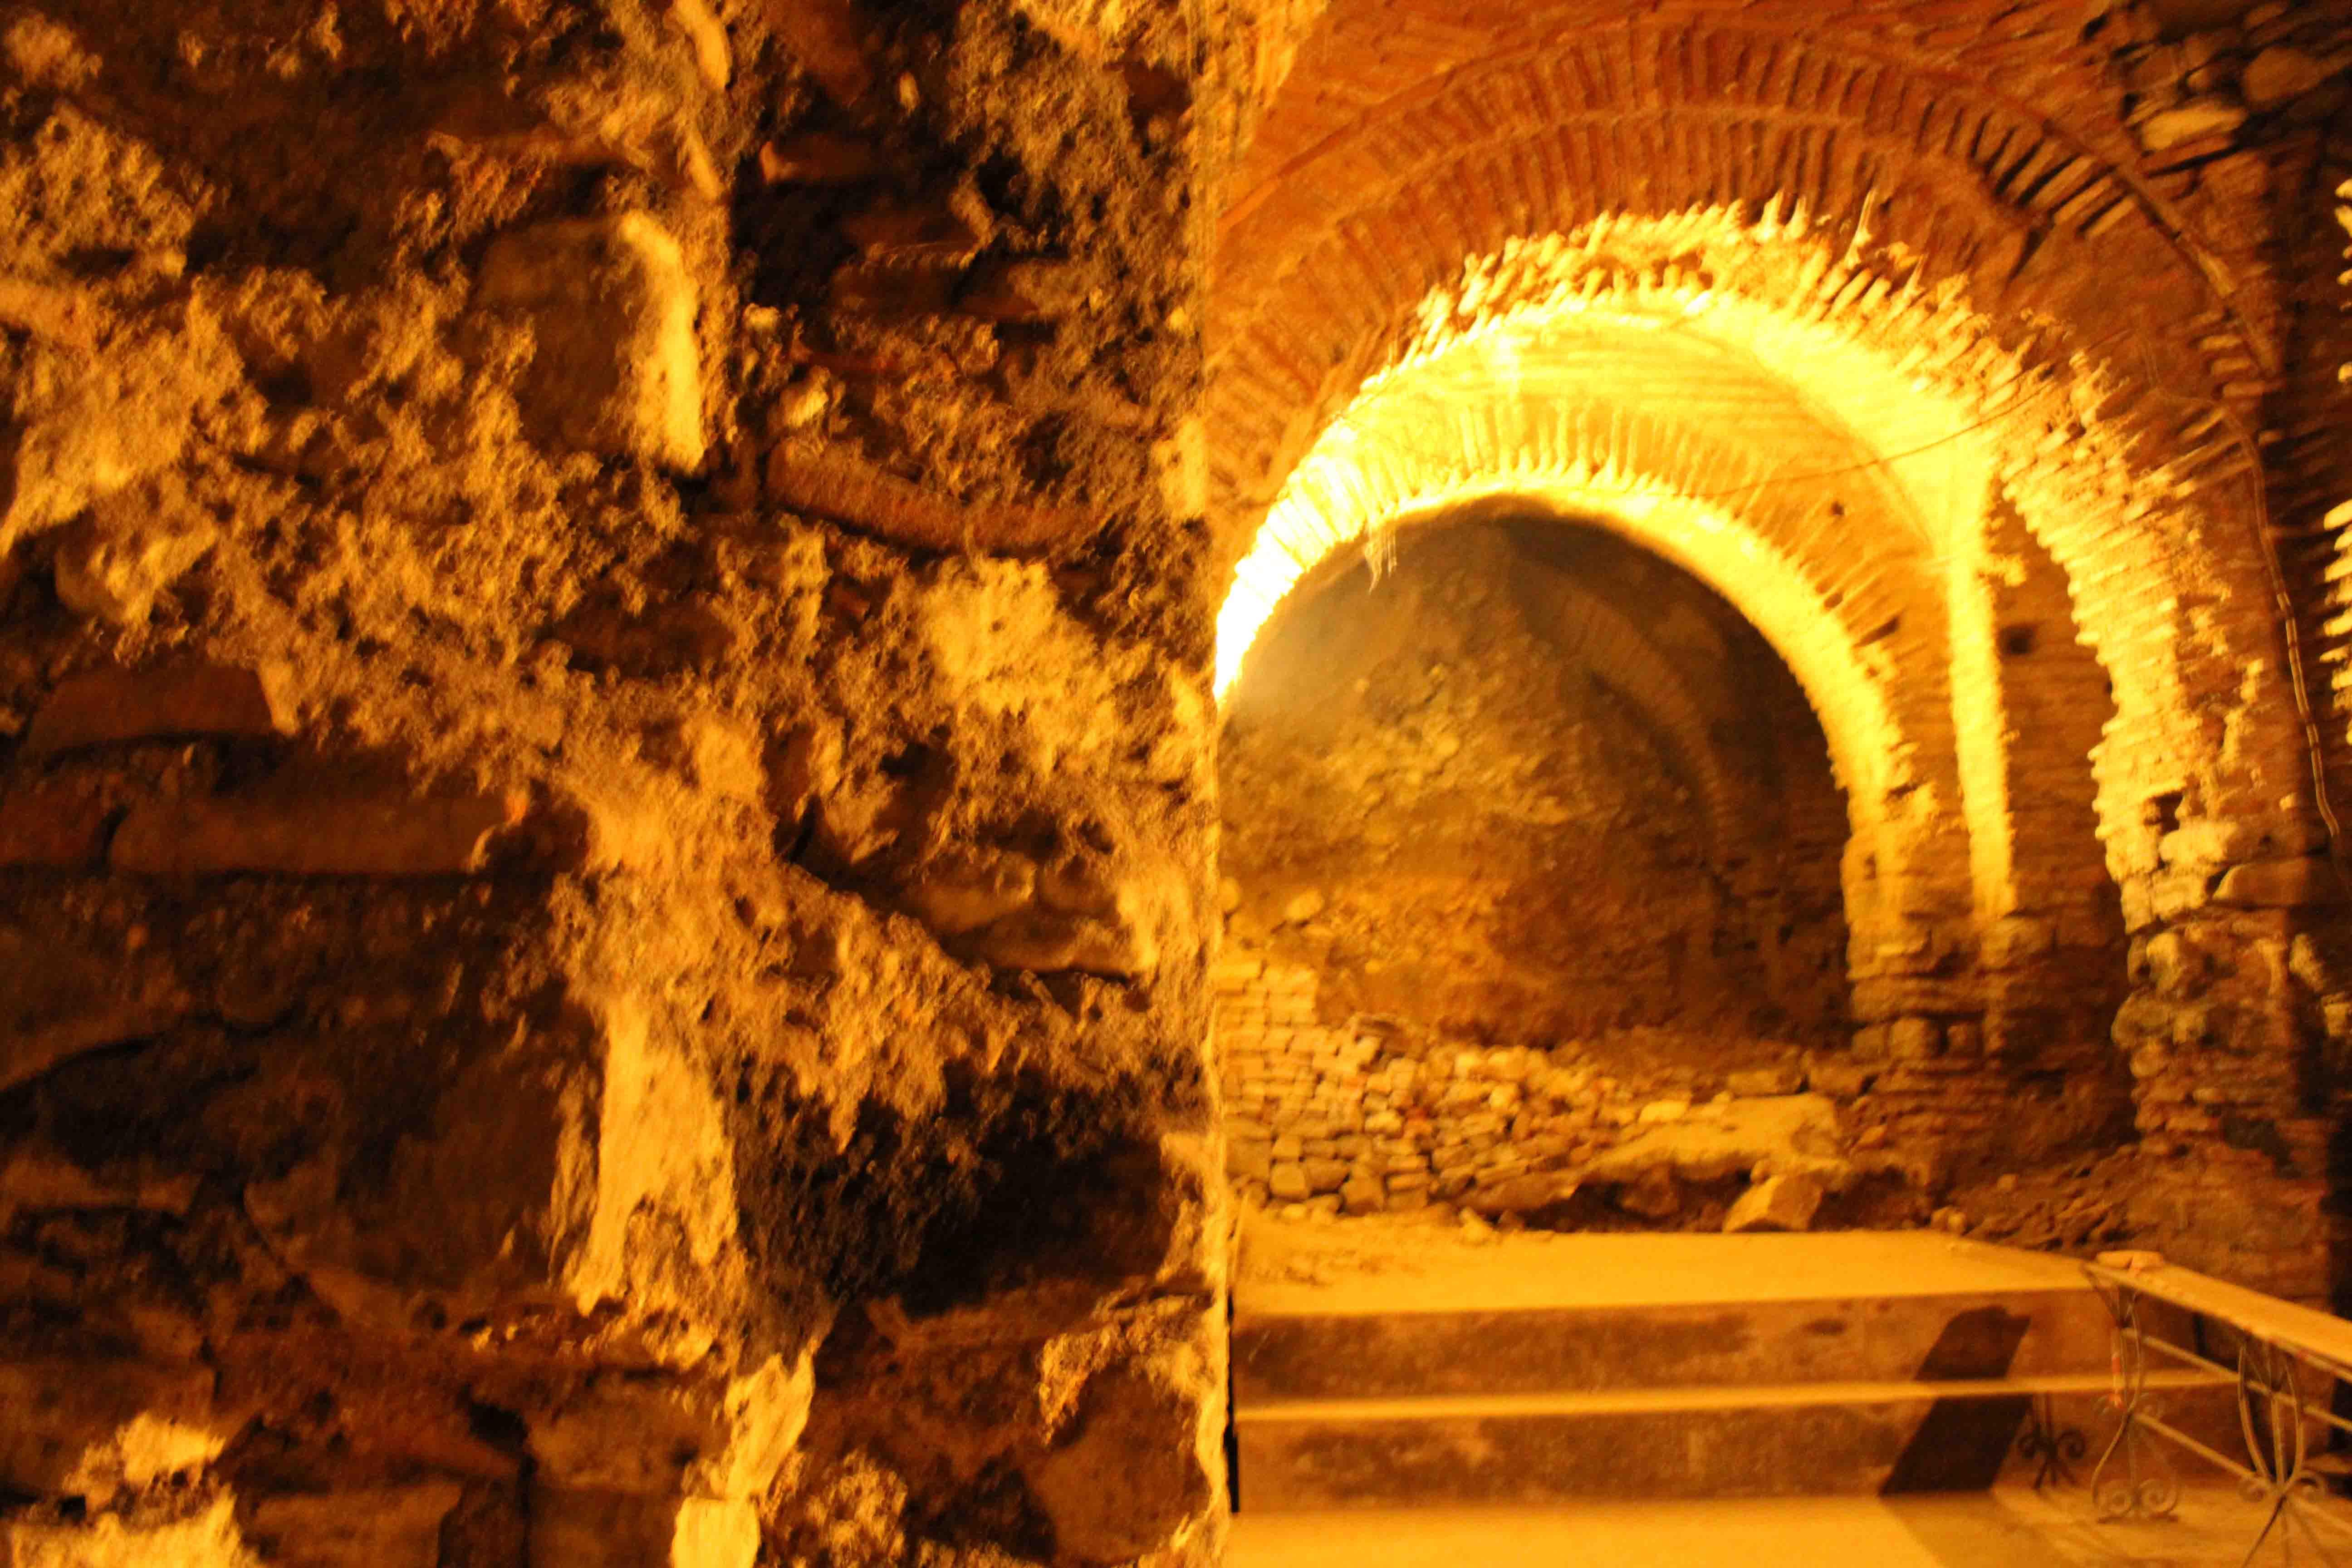 http://www.alburakathisma.com/images/galeri/orjinal/albura-Cistern-87.jpg